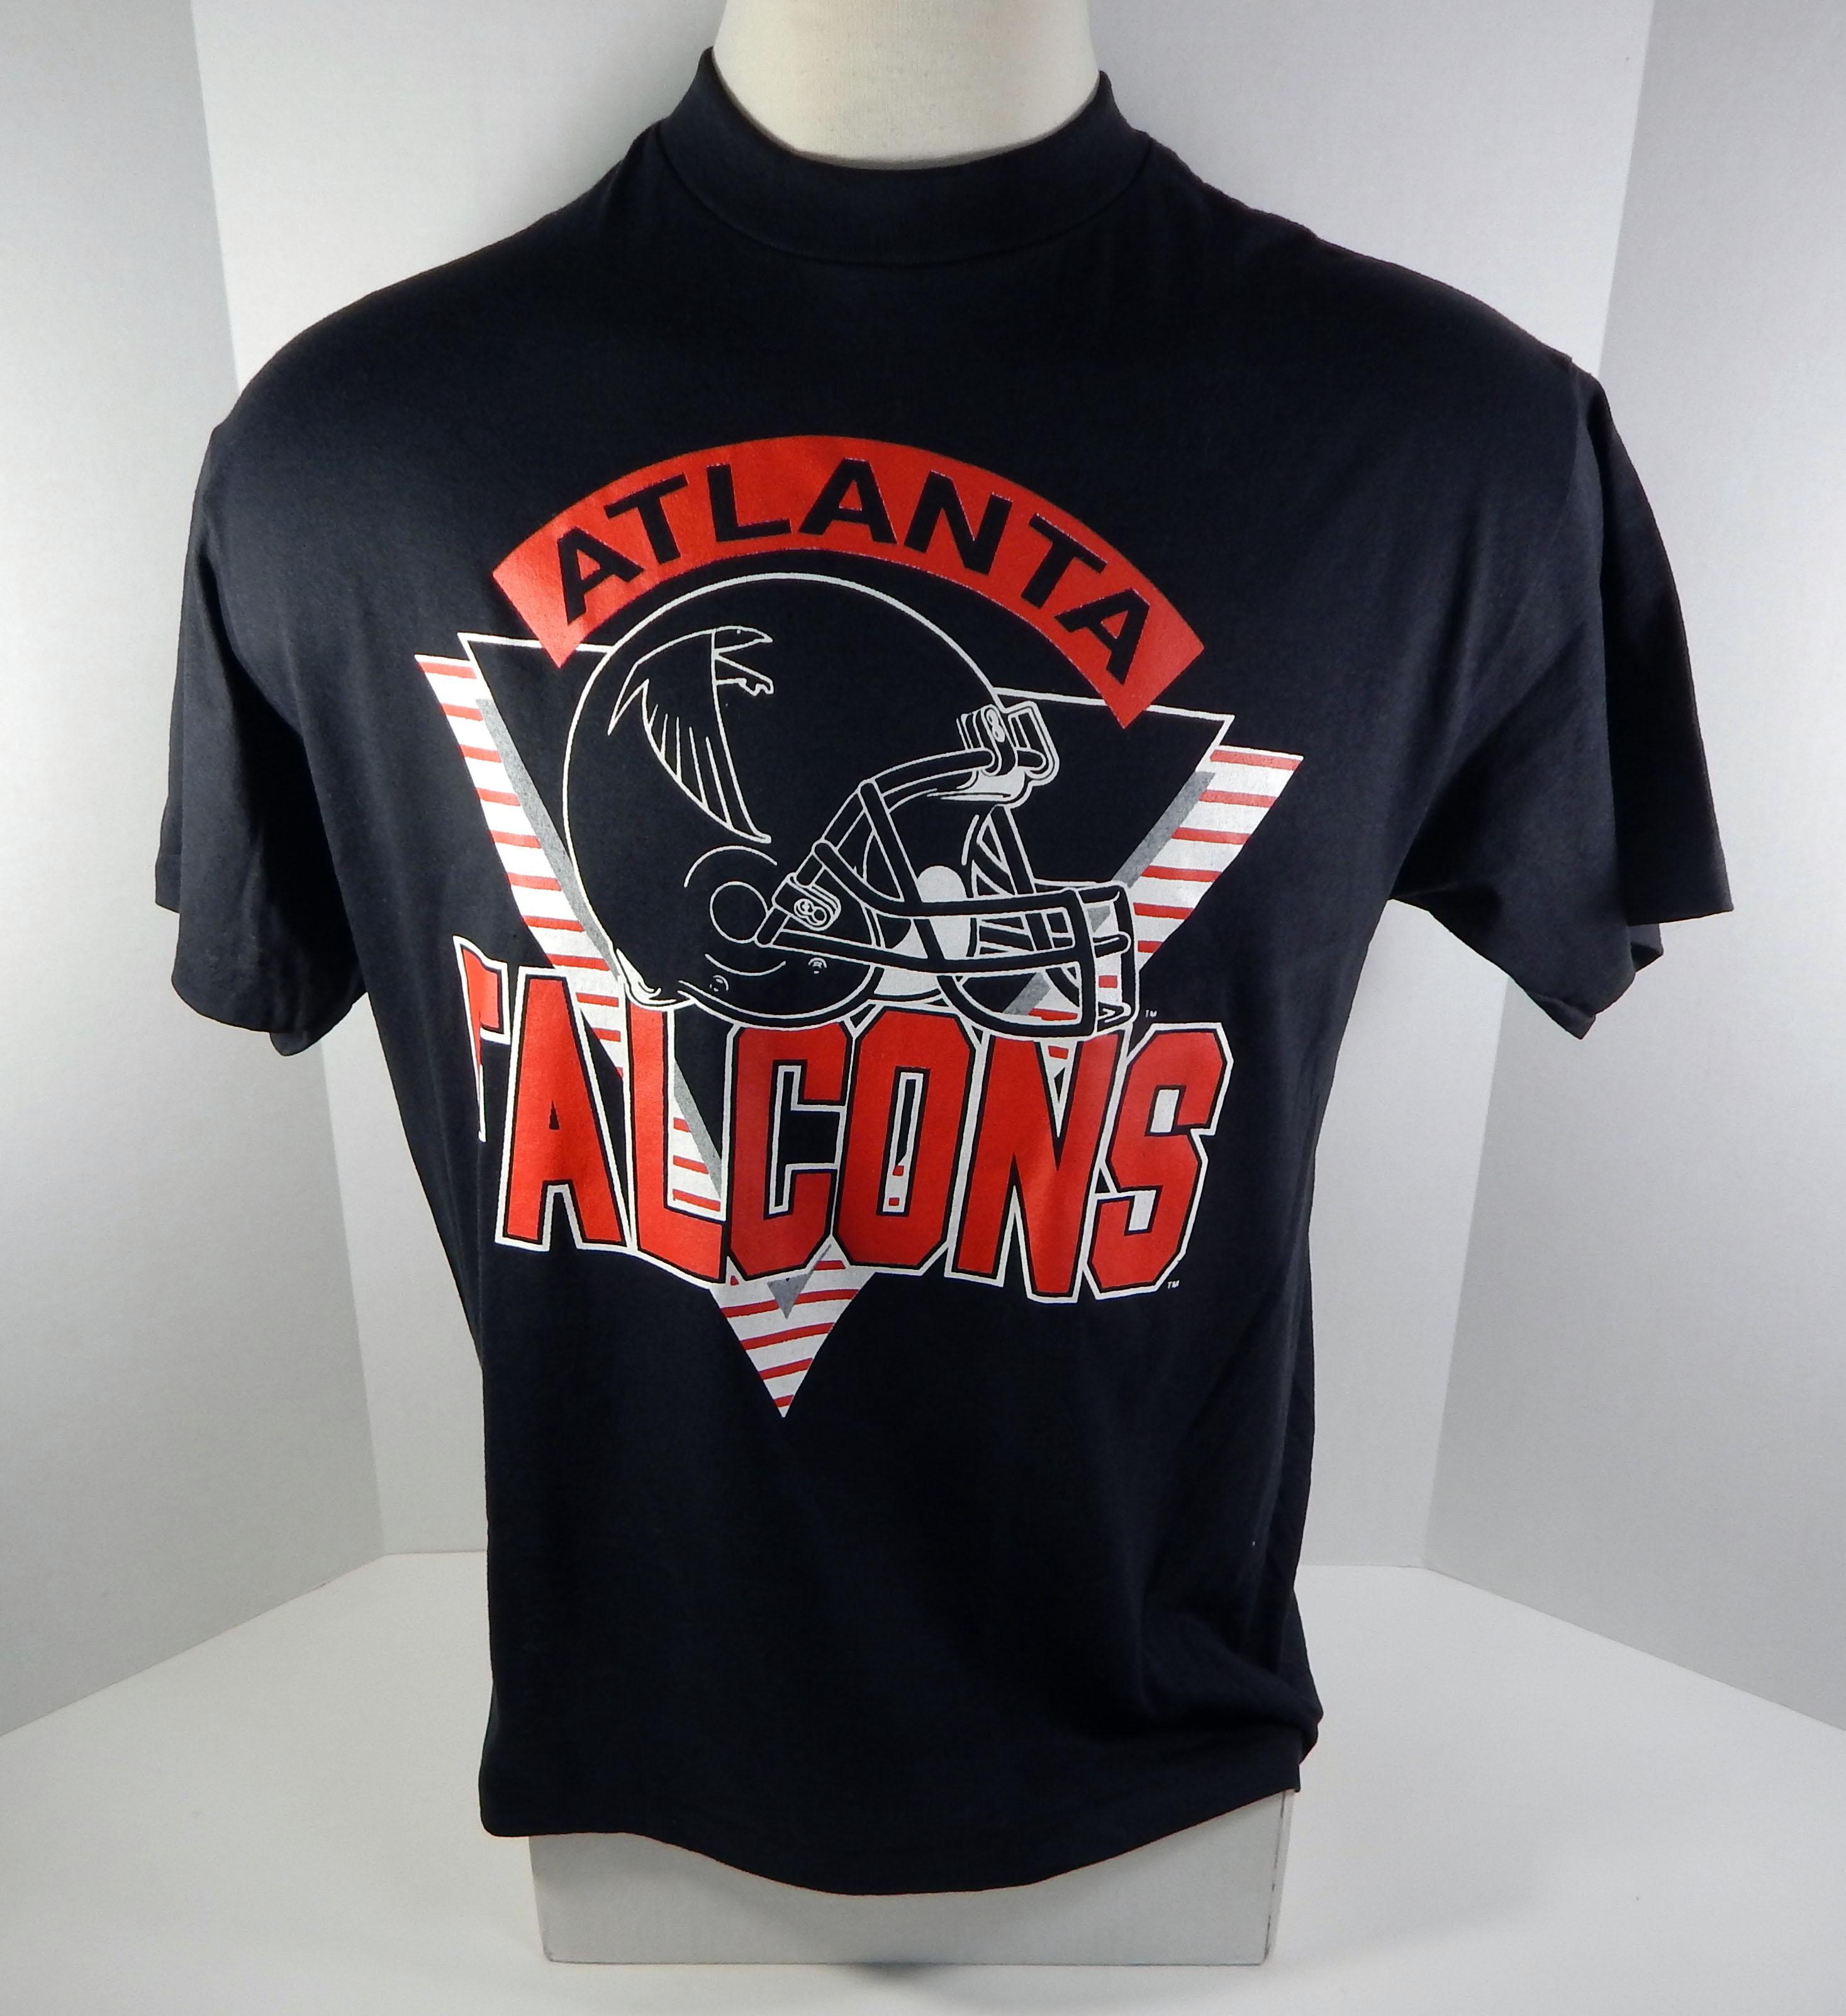 Image is loading Vintage-Atlanta-Falcons-Black-Trench-T-Shirt-Size- 4c983b592